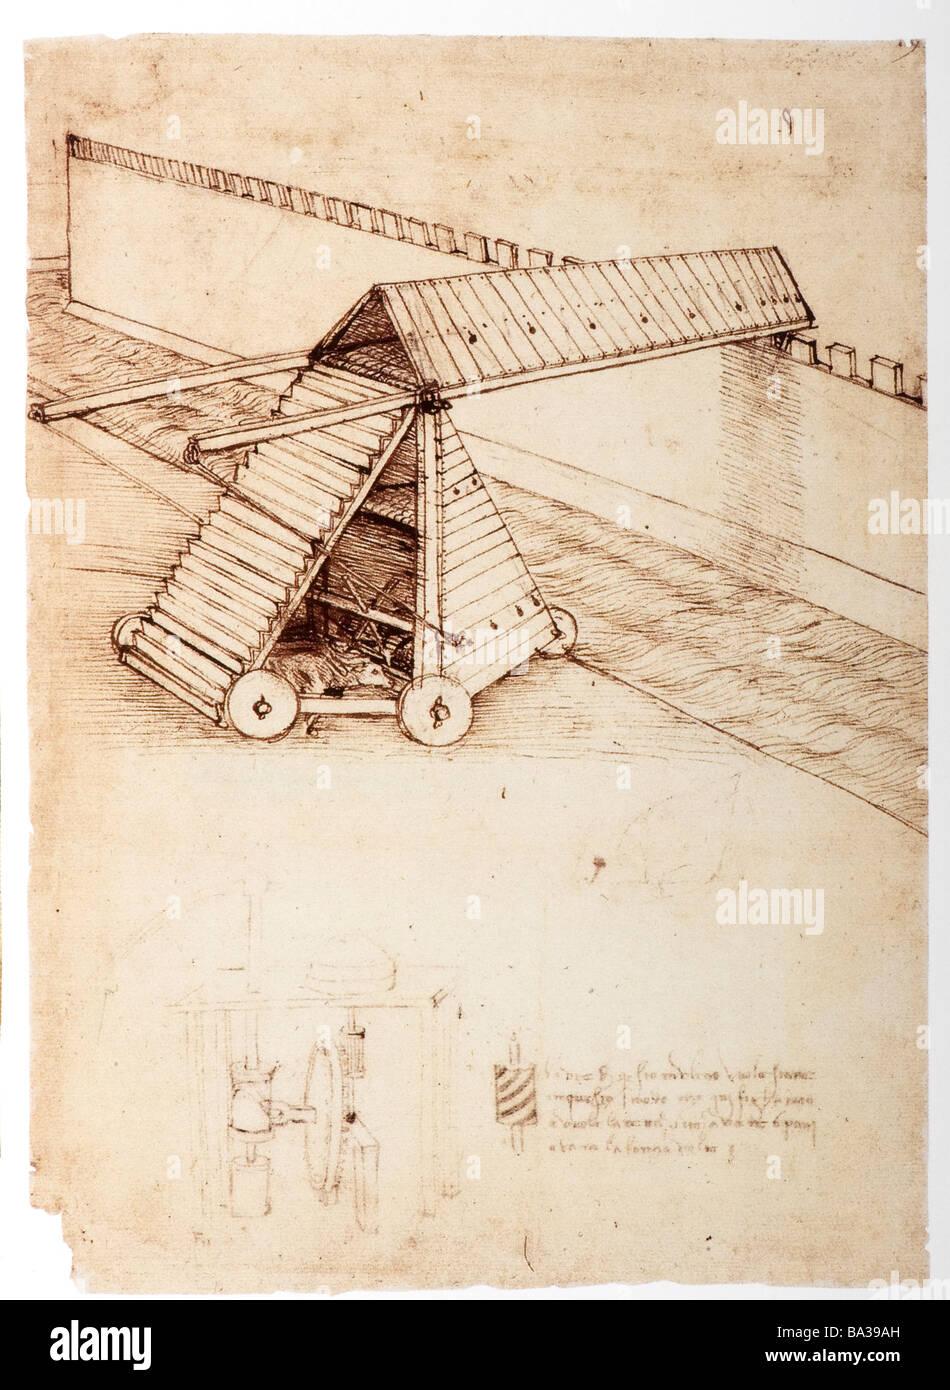 Design for a Siege Machine with Covered Bridge by Leonardo da Vinci 1480 pen and ink - Stock Image